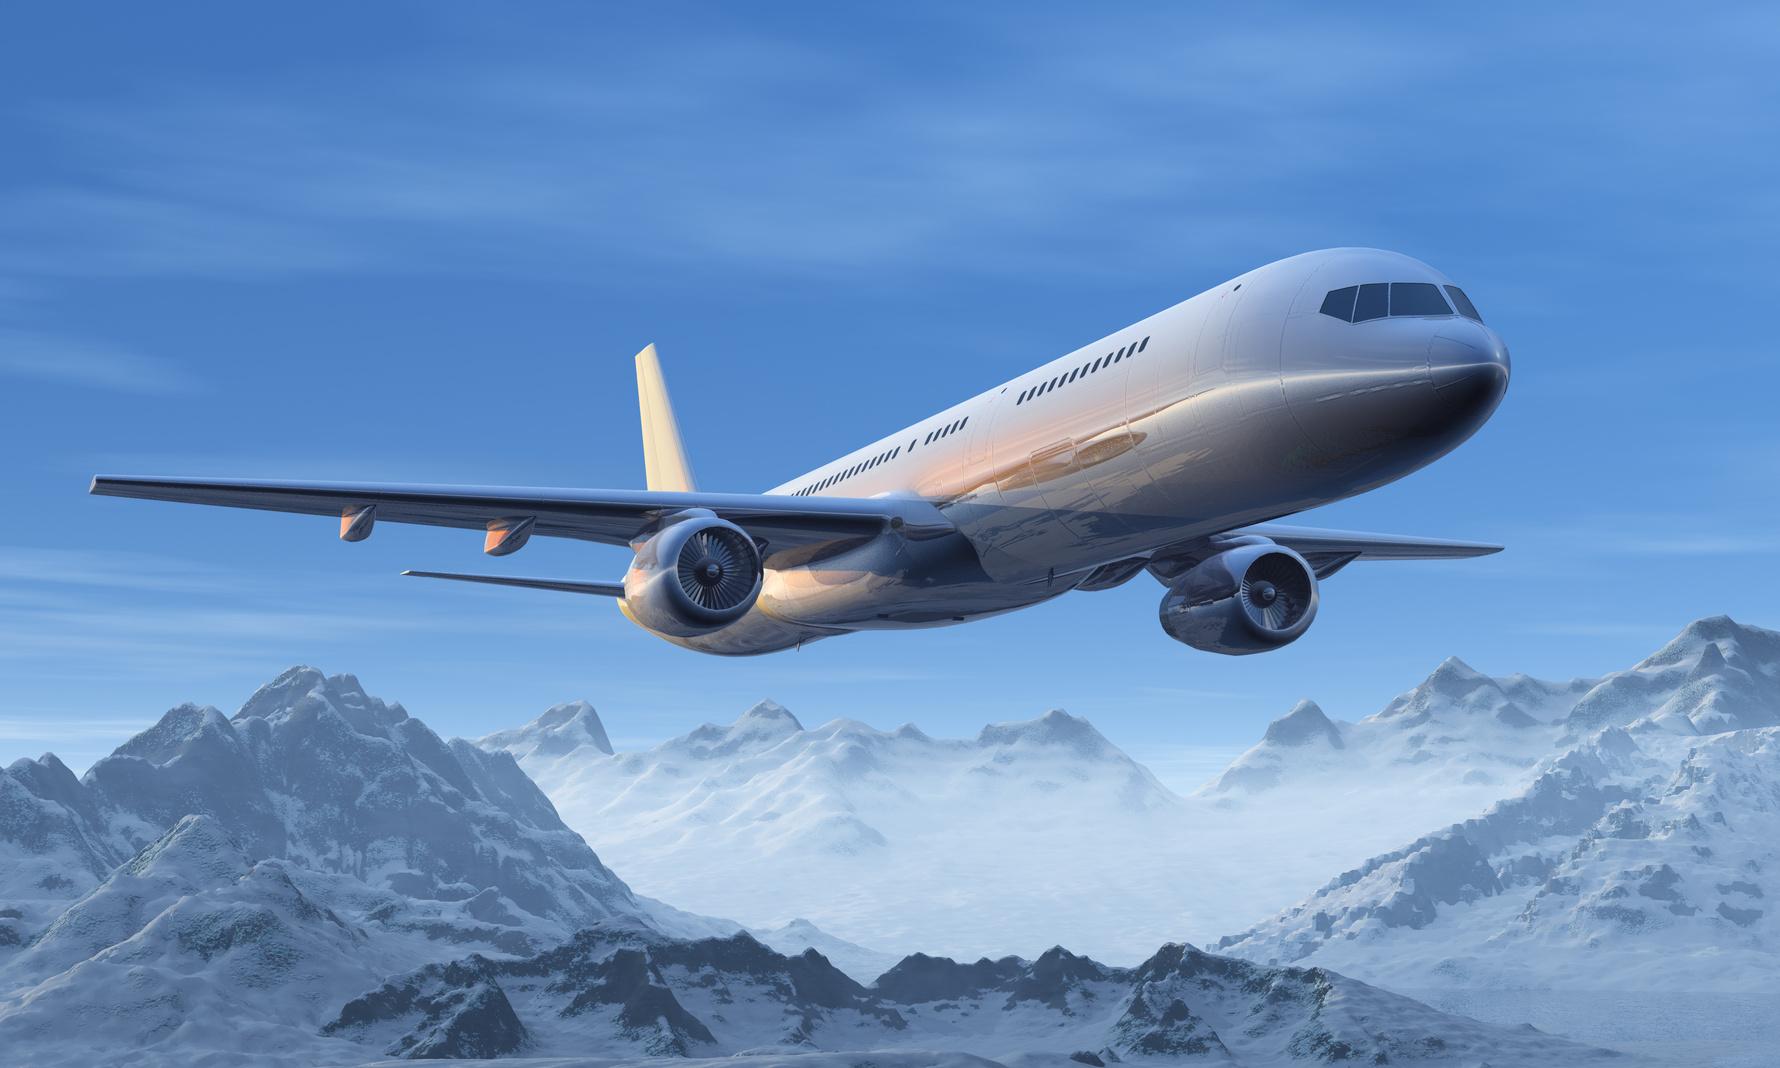 Plane over Alps